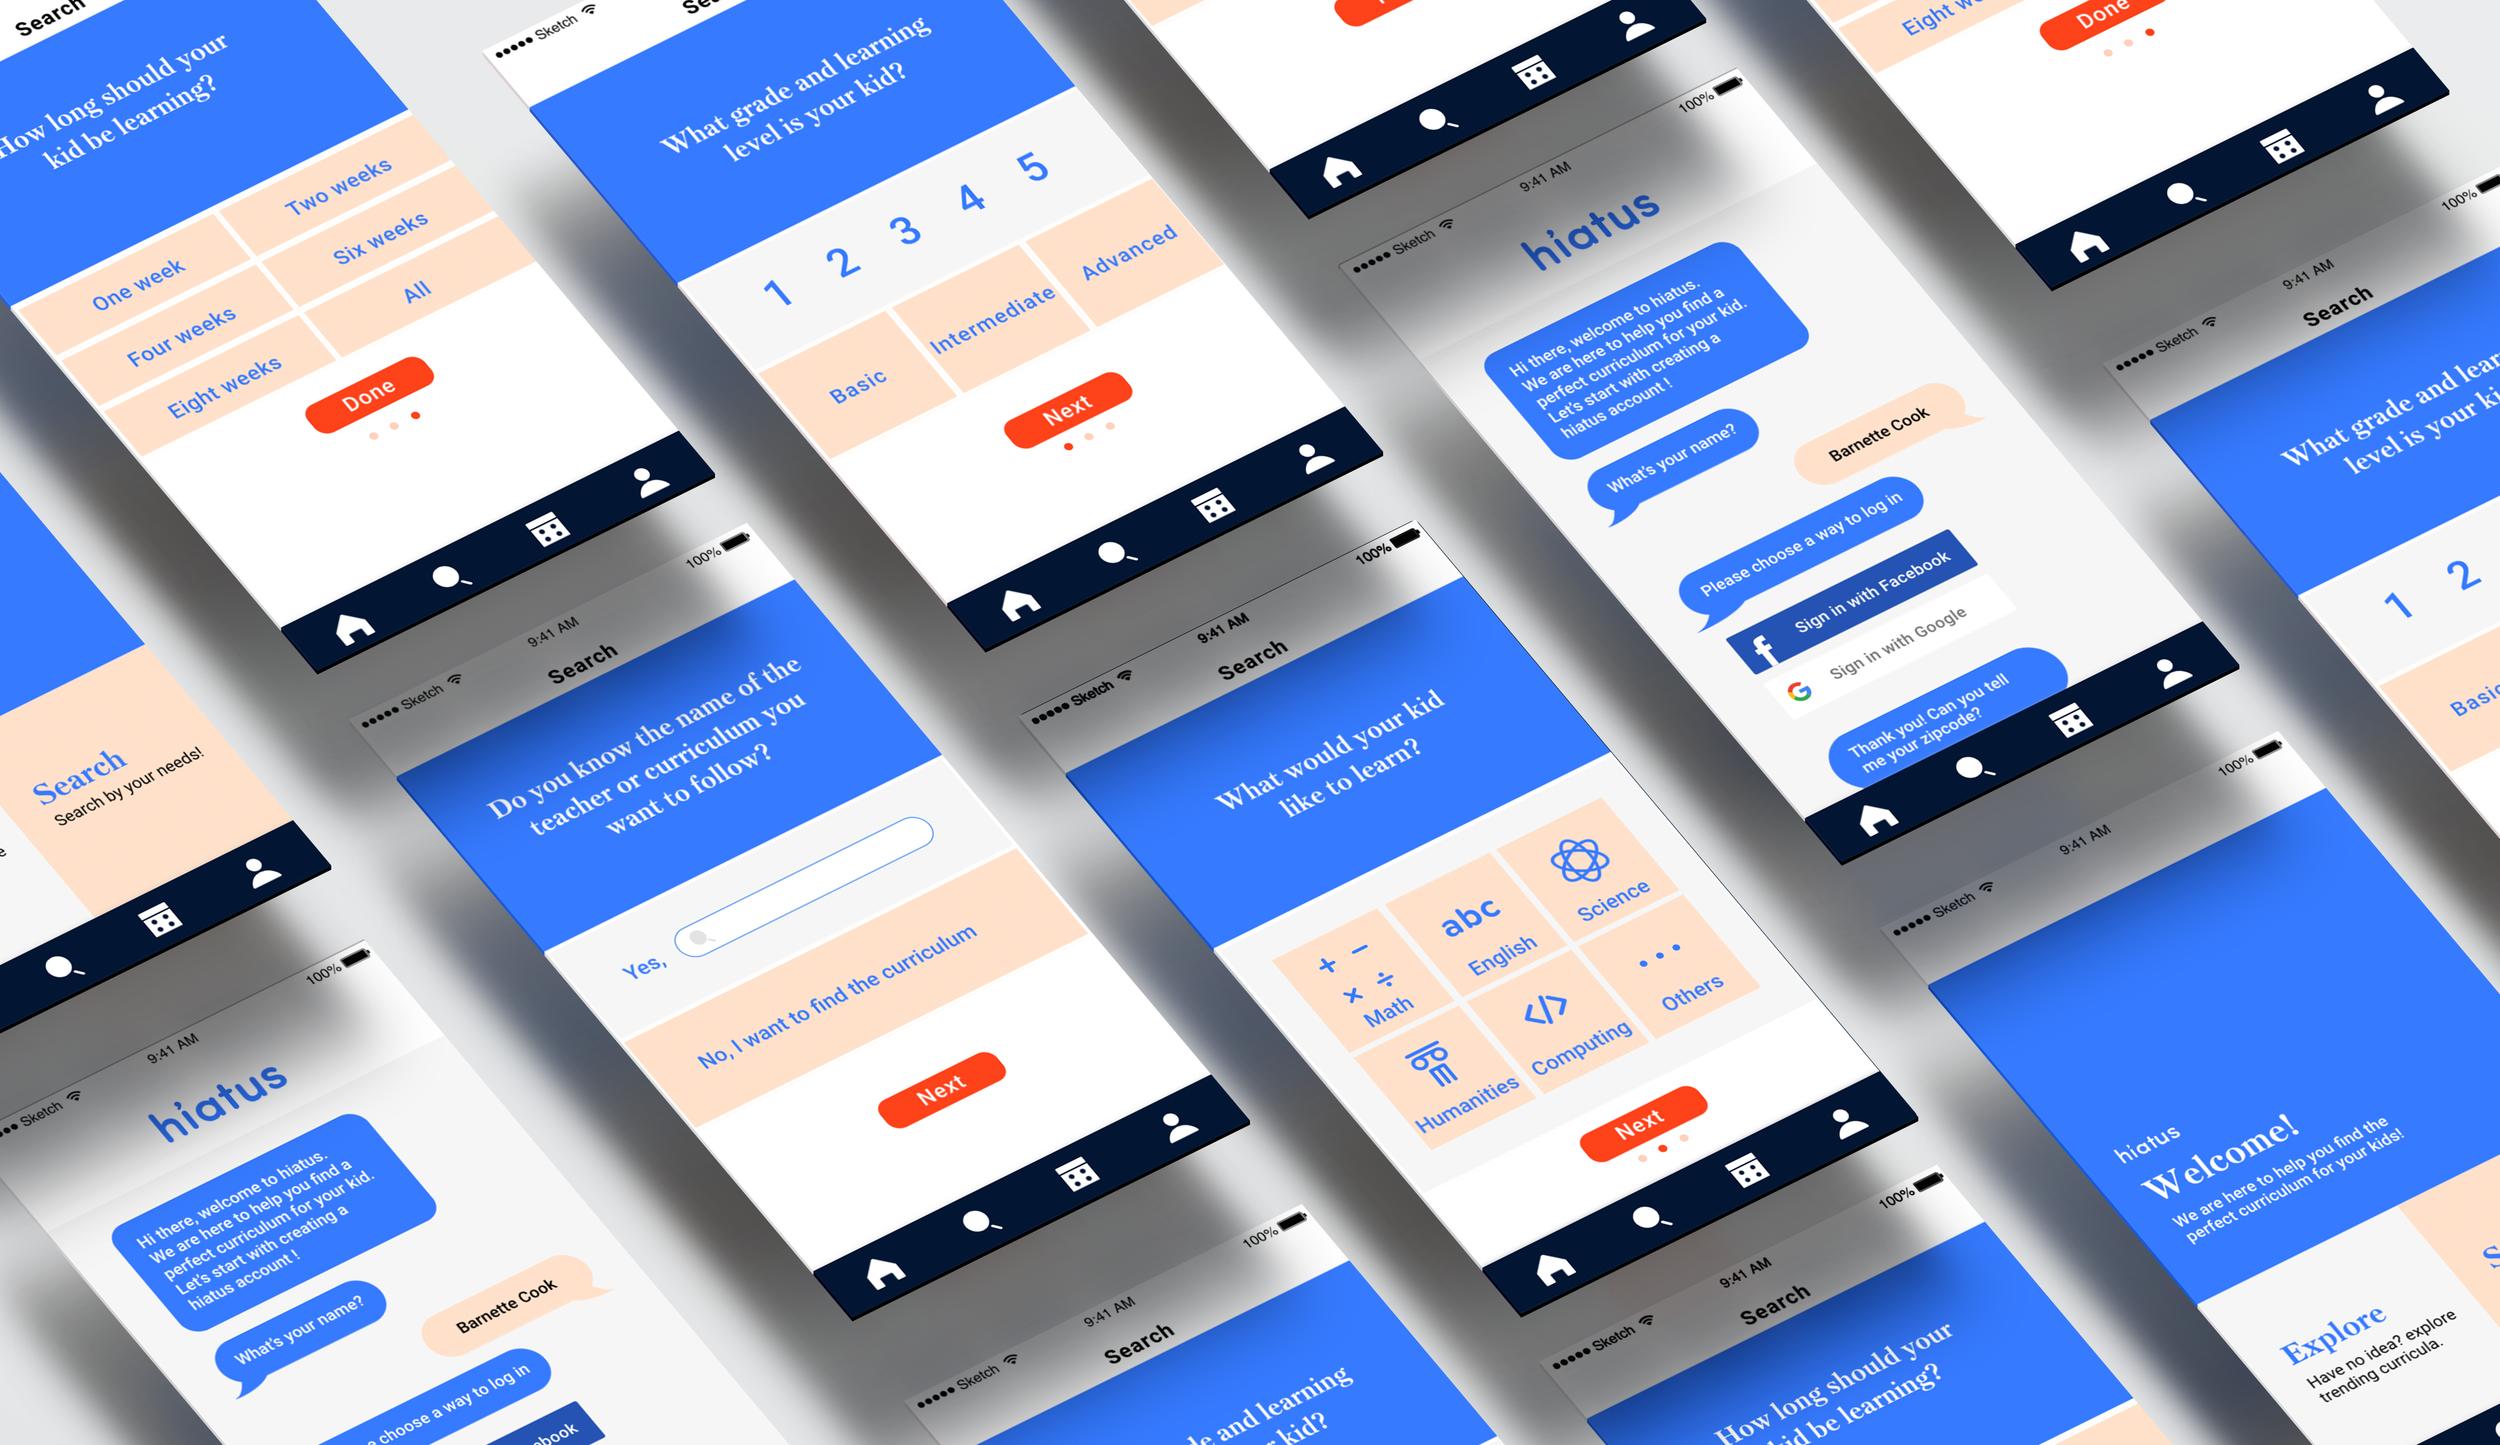 Perspective-App-Screens-Mock-Up-16.png